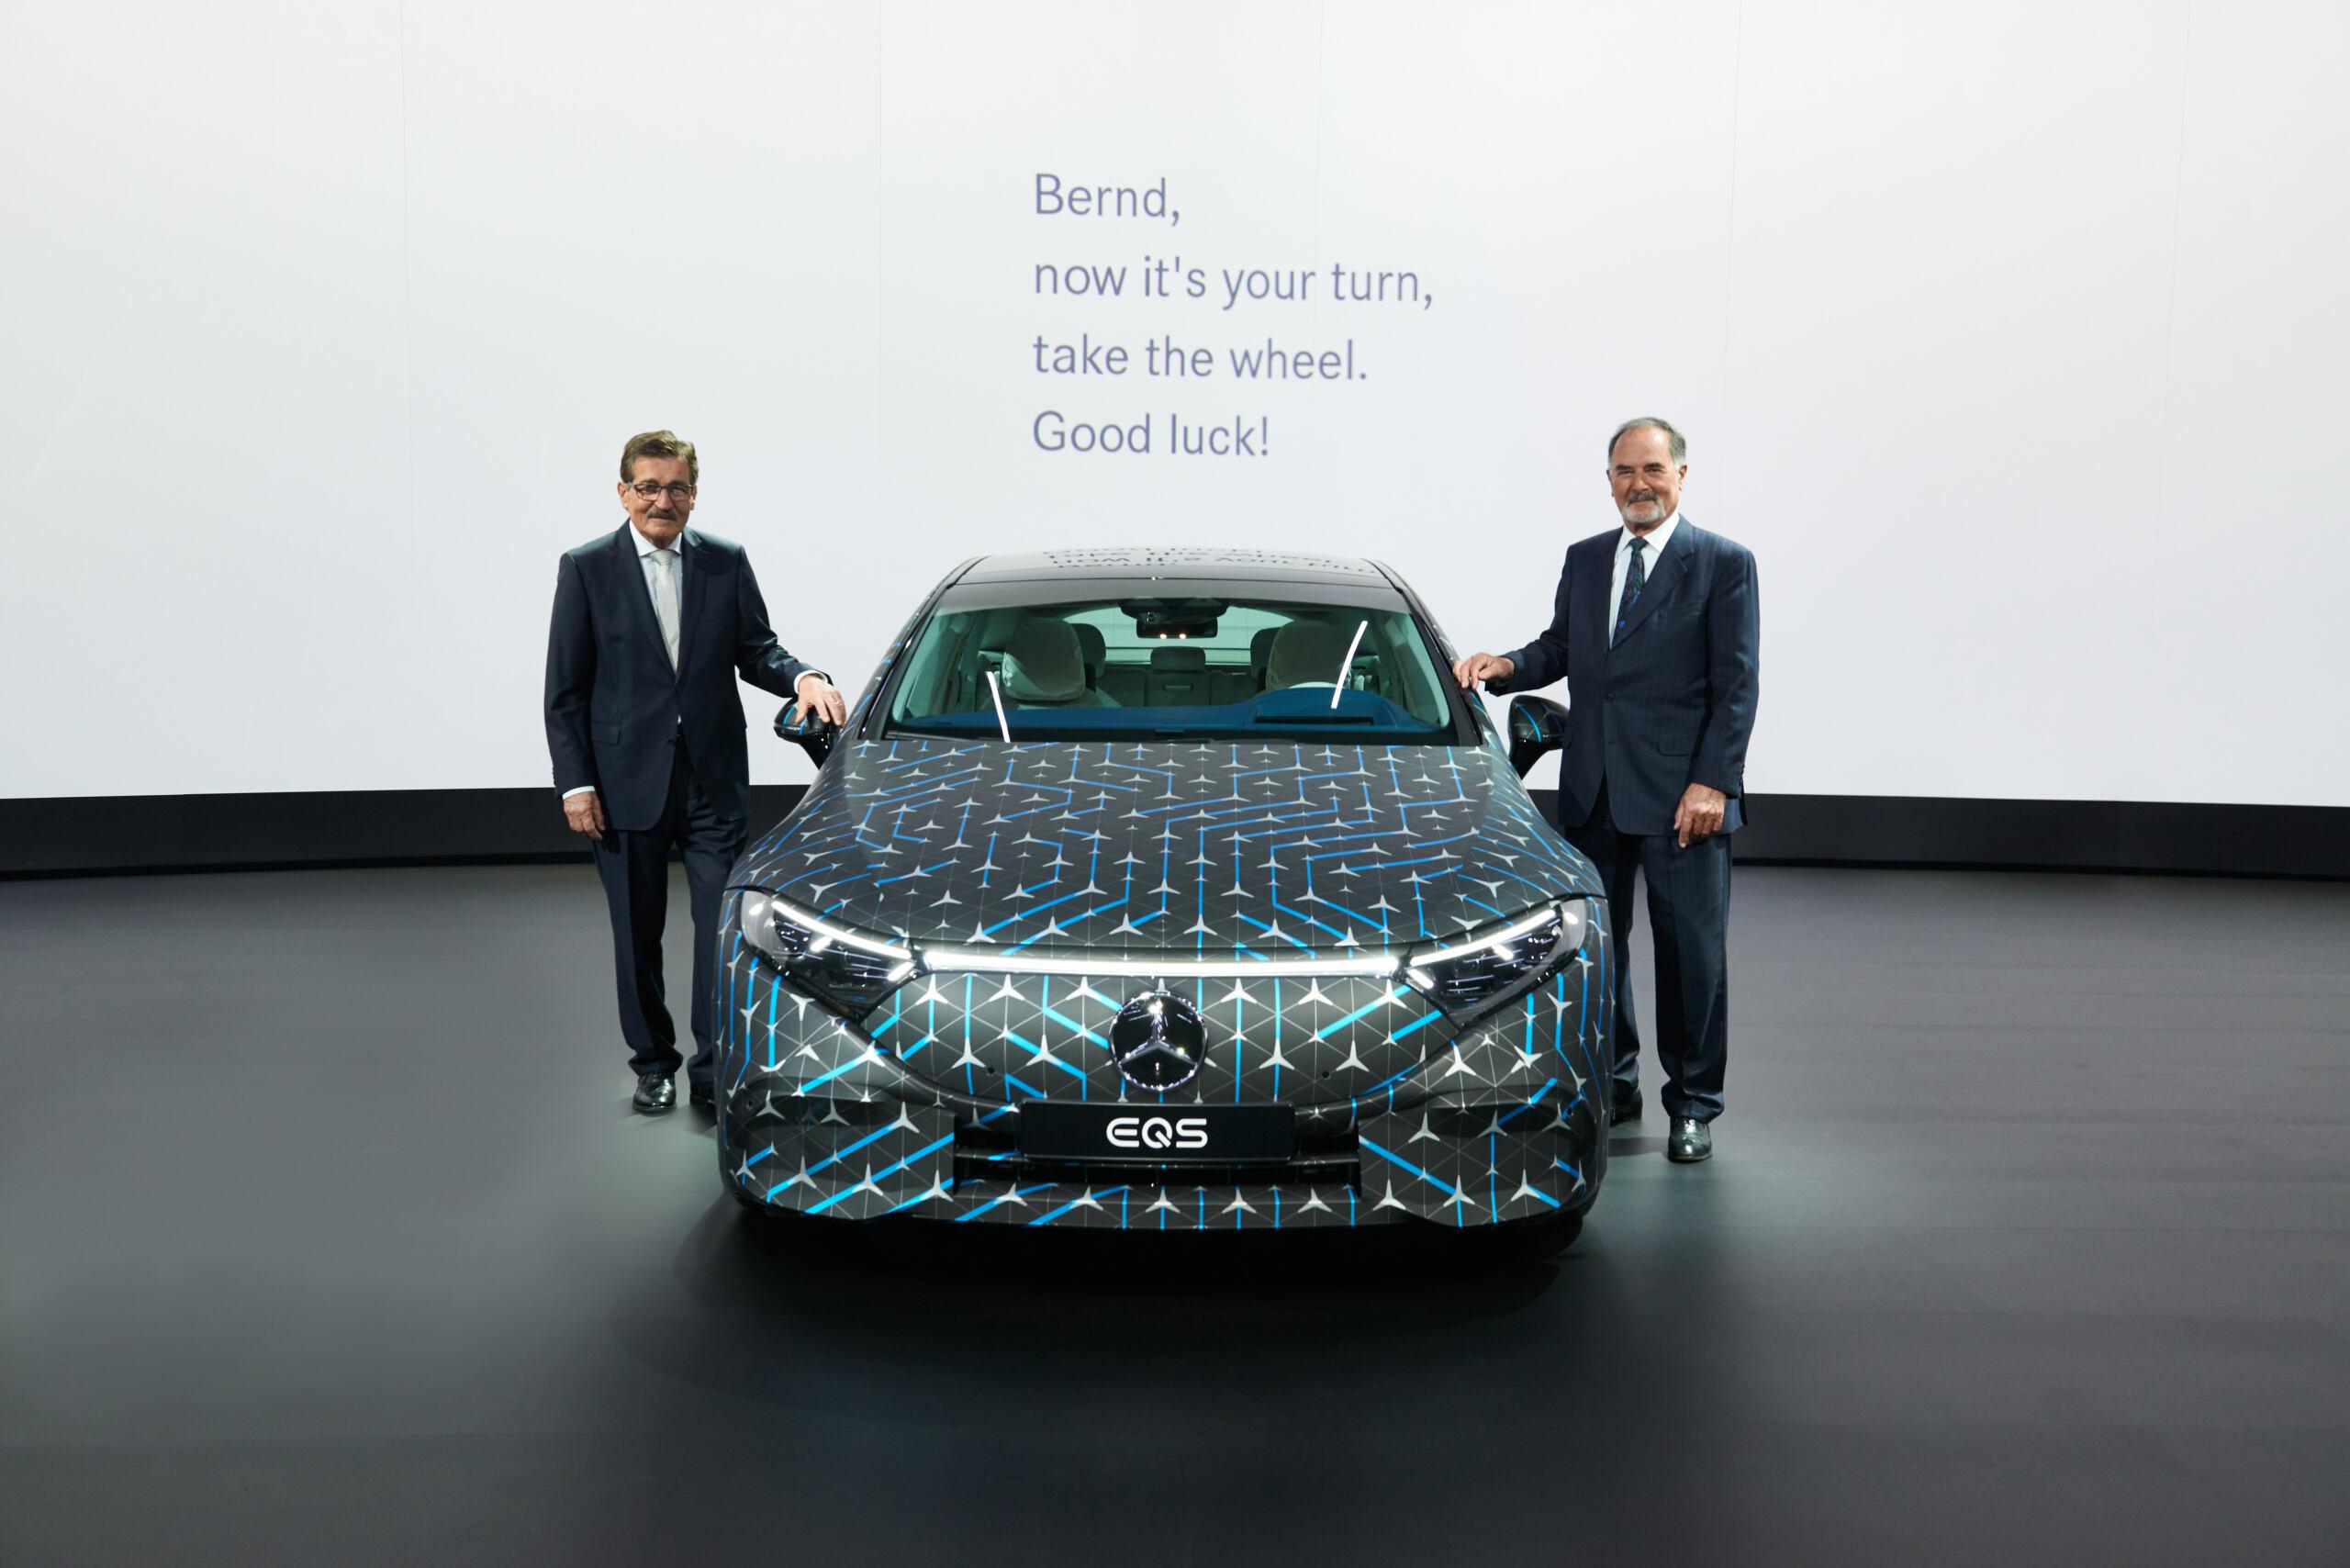 Bernd Pischetsrieder nuovo presidente consiglio sorveglianza Daimler AG